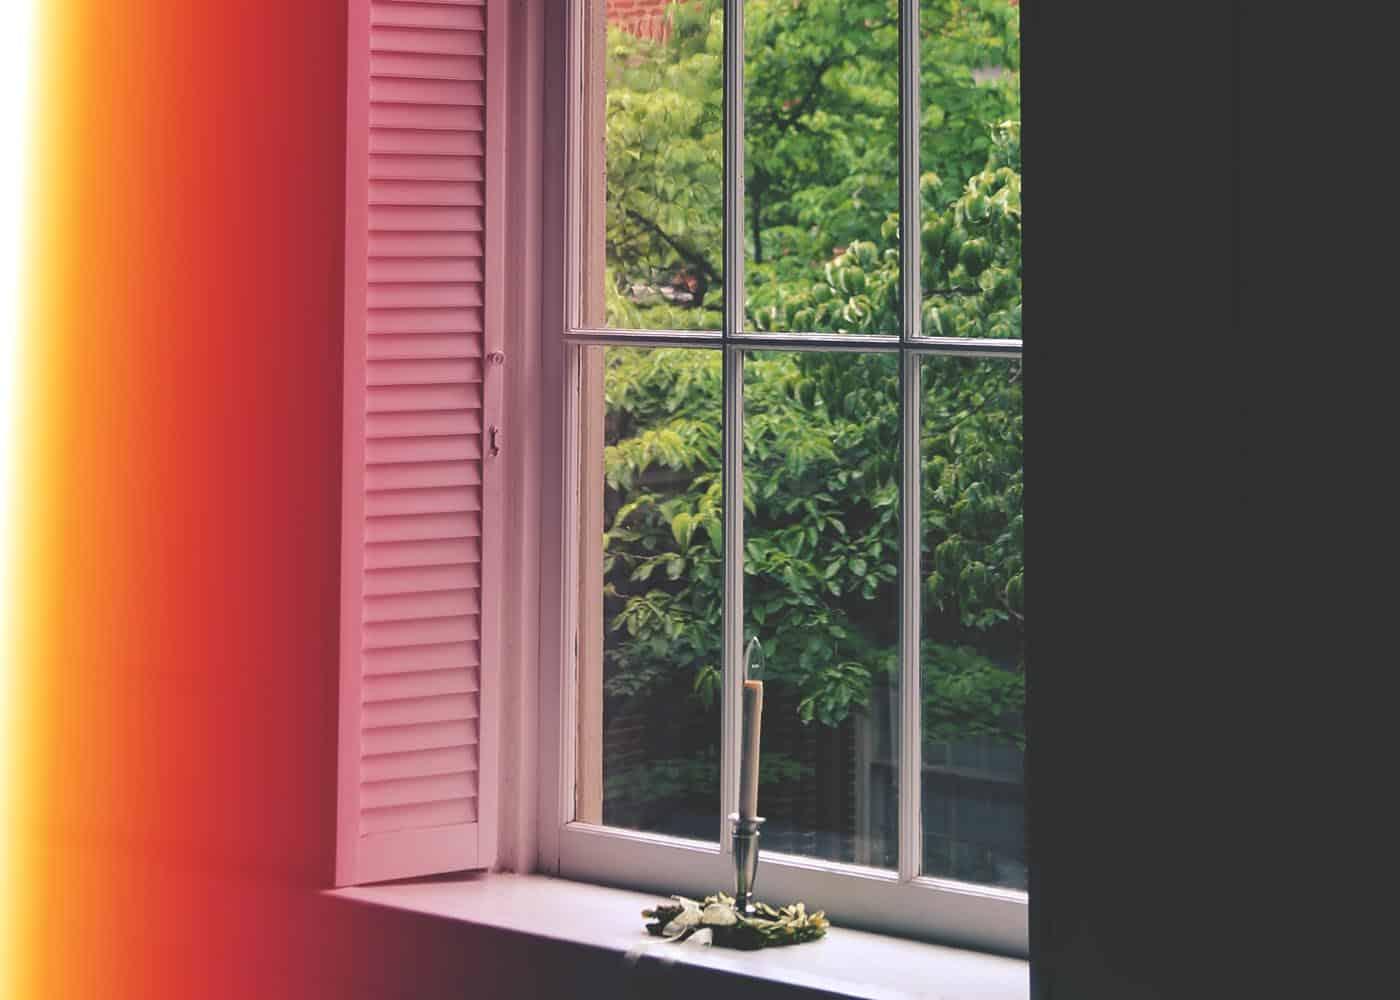 A window pane in Dinwiddie Chapel on the WPU campus.